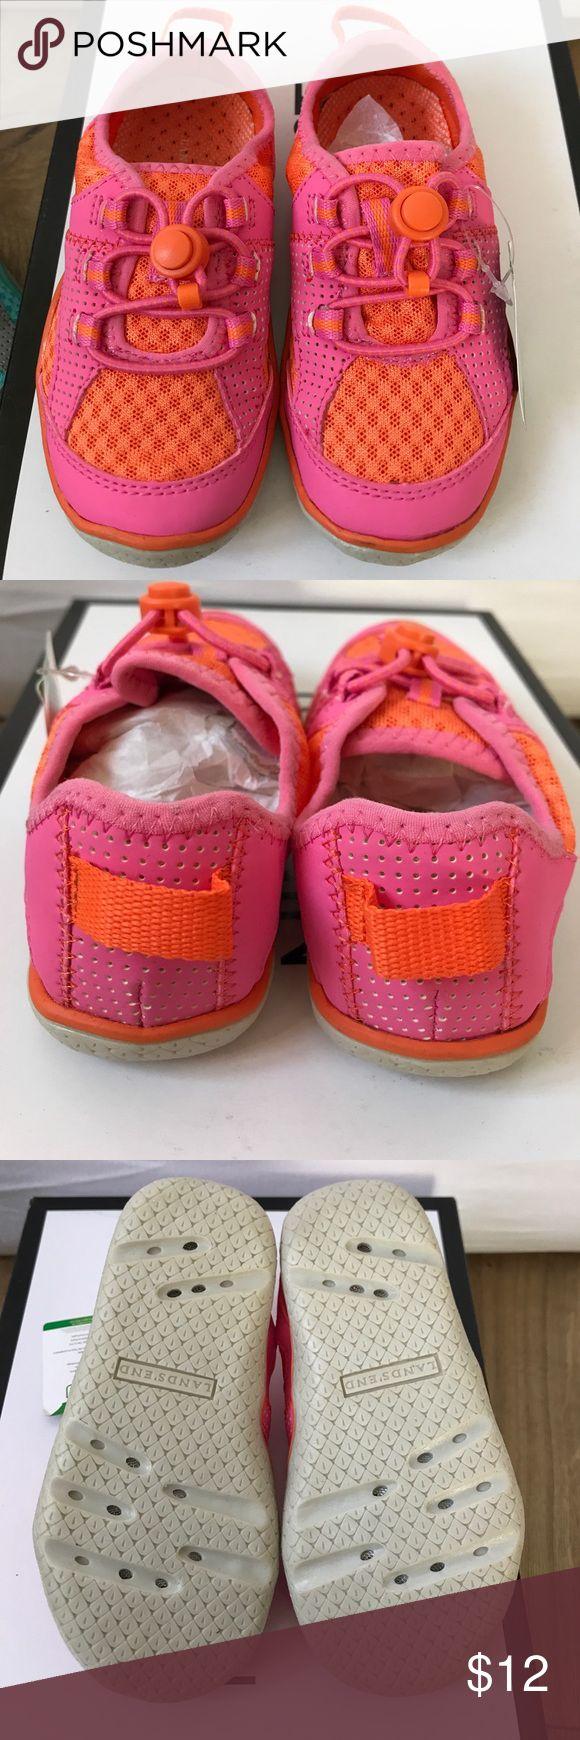 Lands' End Girl water shoes Size 9 Lands' End Girl water shoes Size 9 Youth. Lands' End Shoes Water Shoes